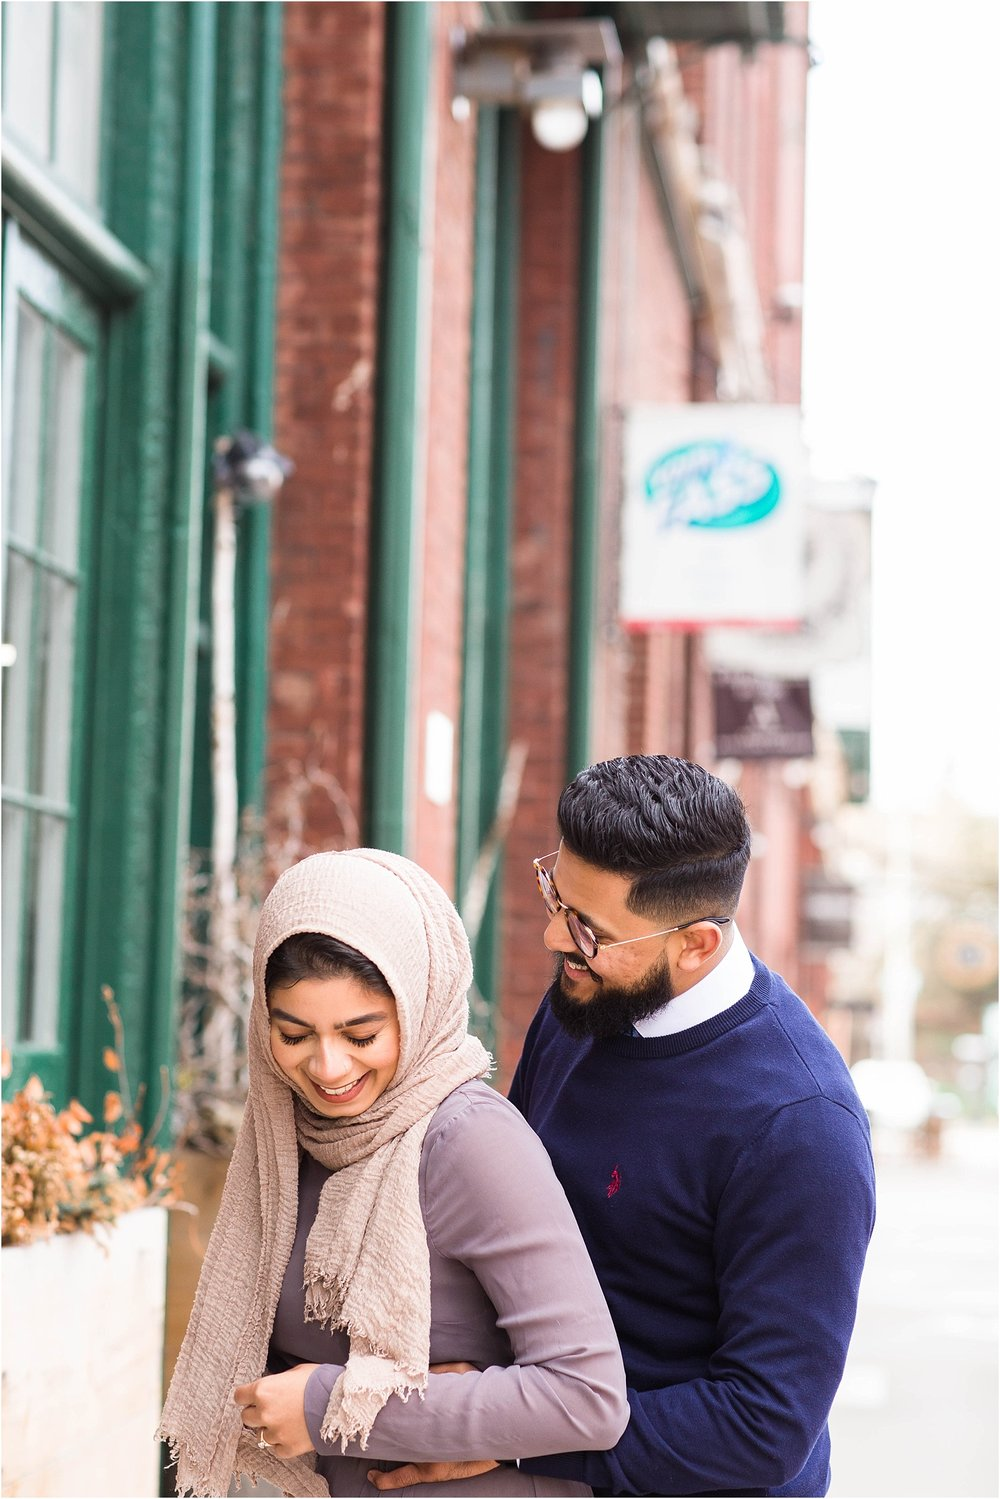 Polson-Pier-Distillery-District-Engagement-Session-Toronto-Mississauga-Brampton-Scarborough-GTA-Pakistani-Indian-Wedding-Engagement-Photographer-Photography_0043.jpg